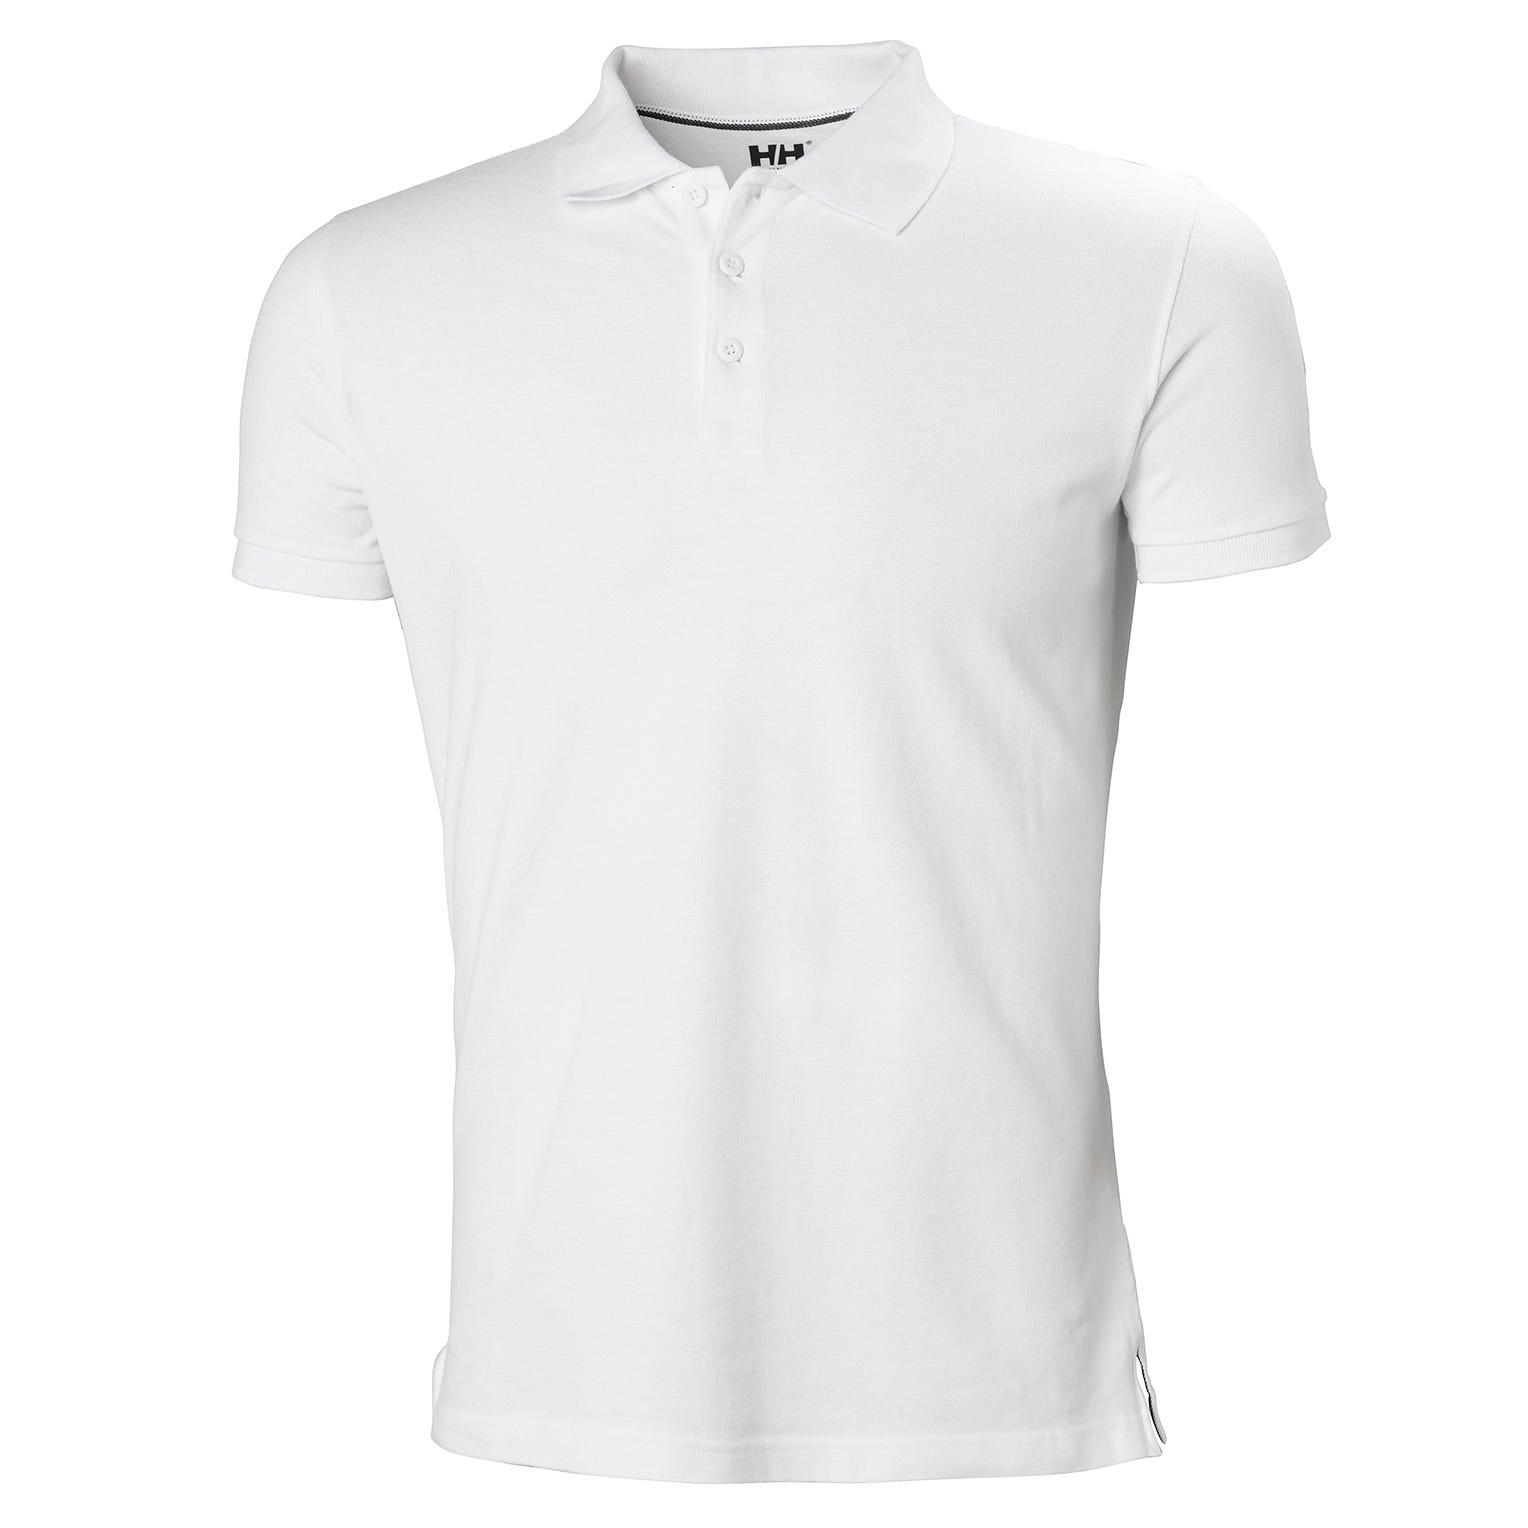 Mens Crew Cotton Pique Quick-dry Polo Shirt | Helly Hansen Mens Performance Wicking White XXL